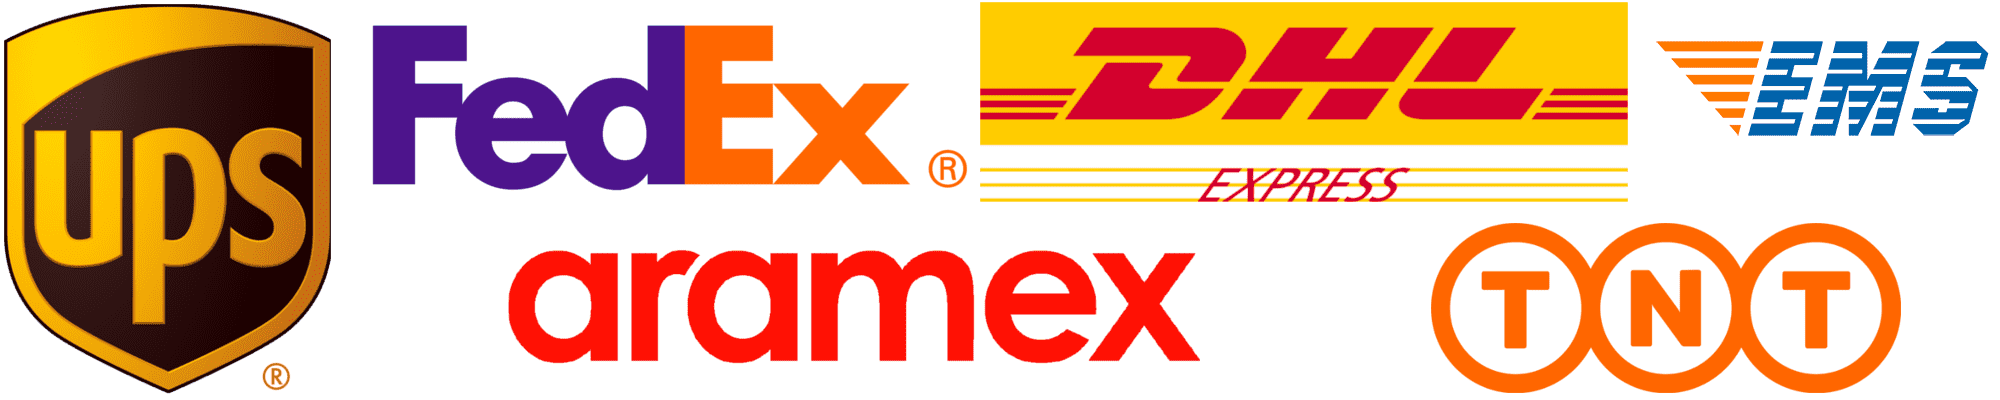 express-courier logo